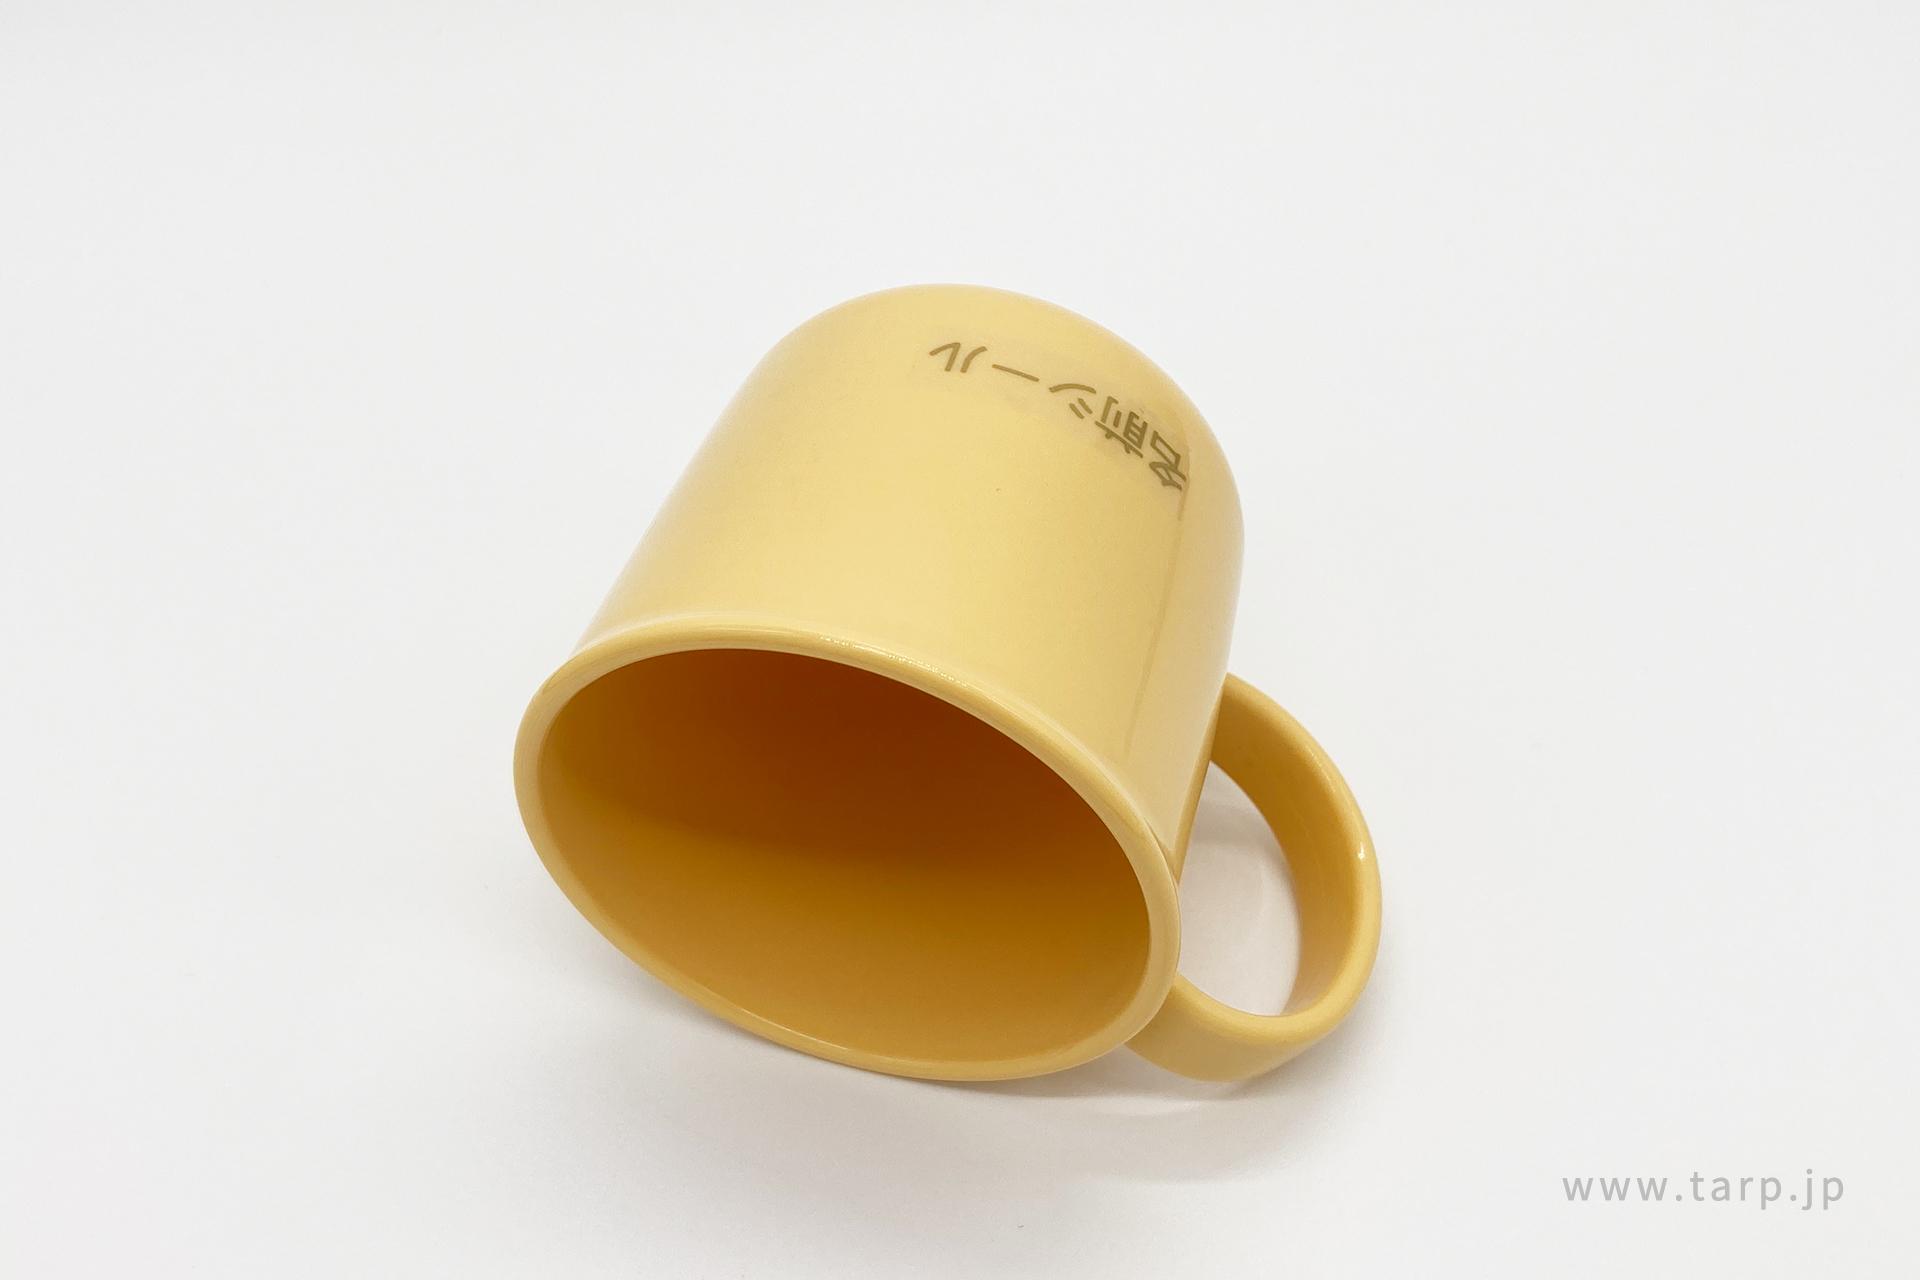 l-review-tepra-gold-ink03